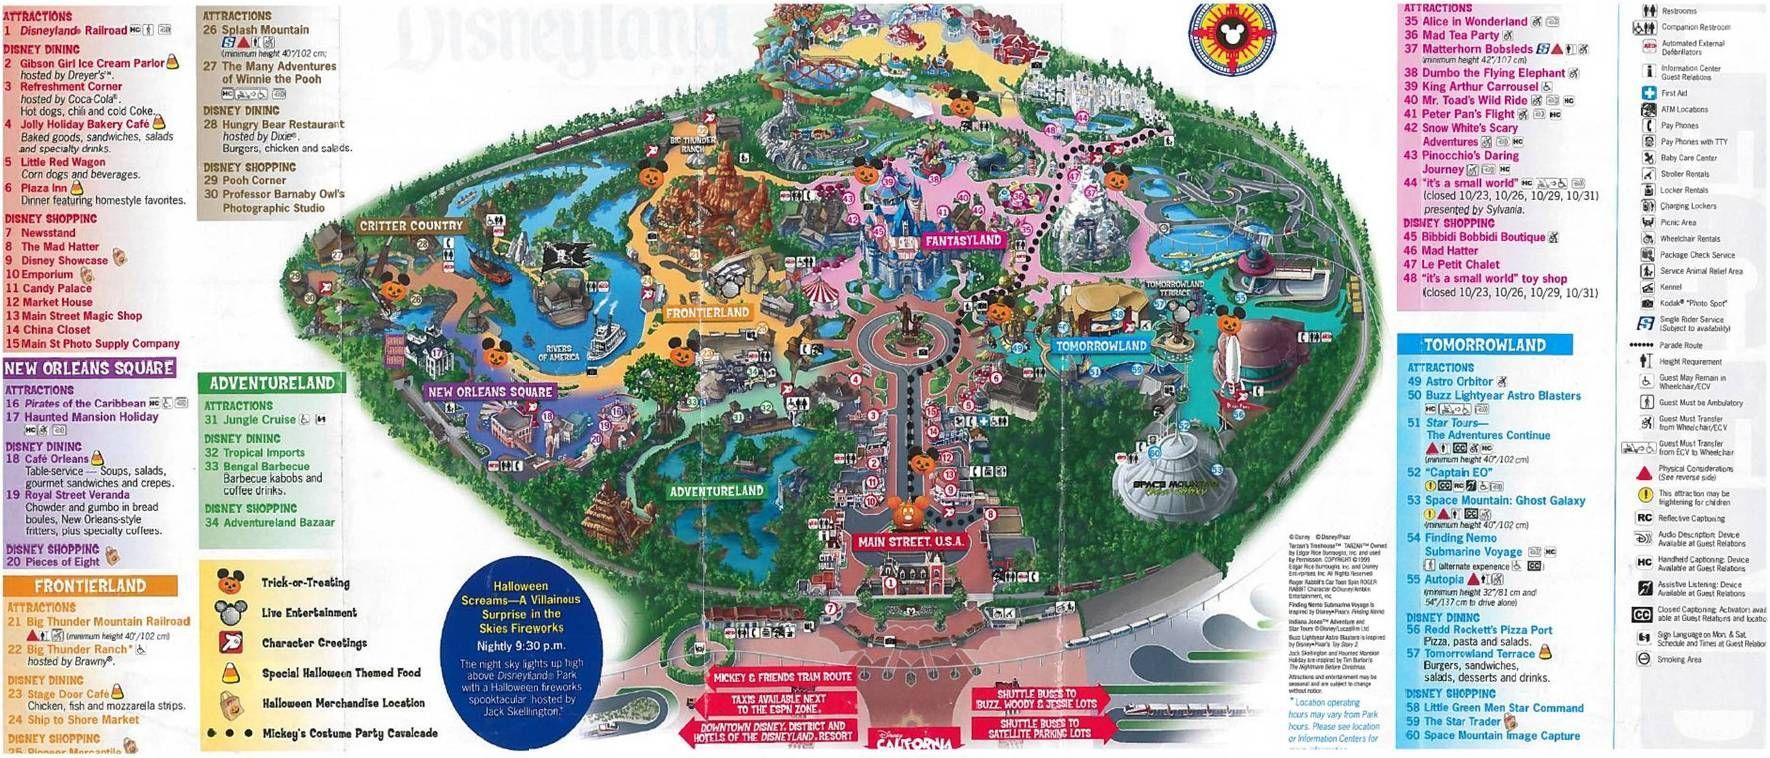 Disneyland Halloween Map Vacation Station Pinterest - Disneyland usa location map